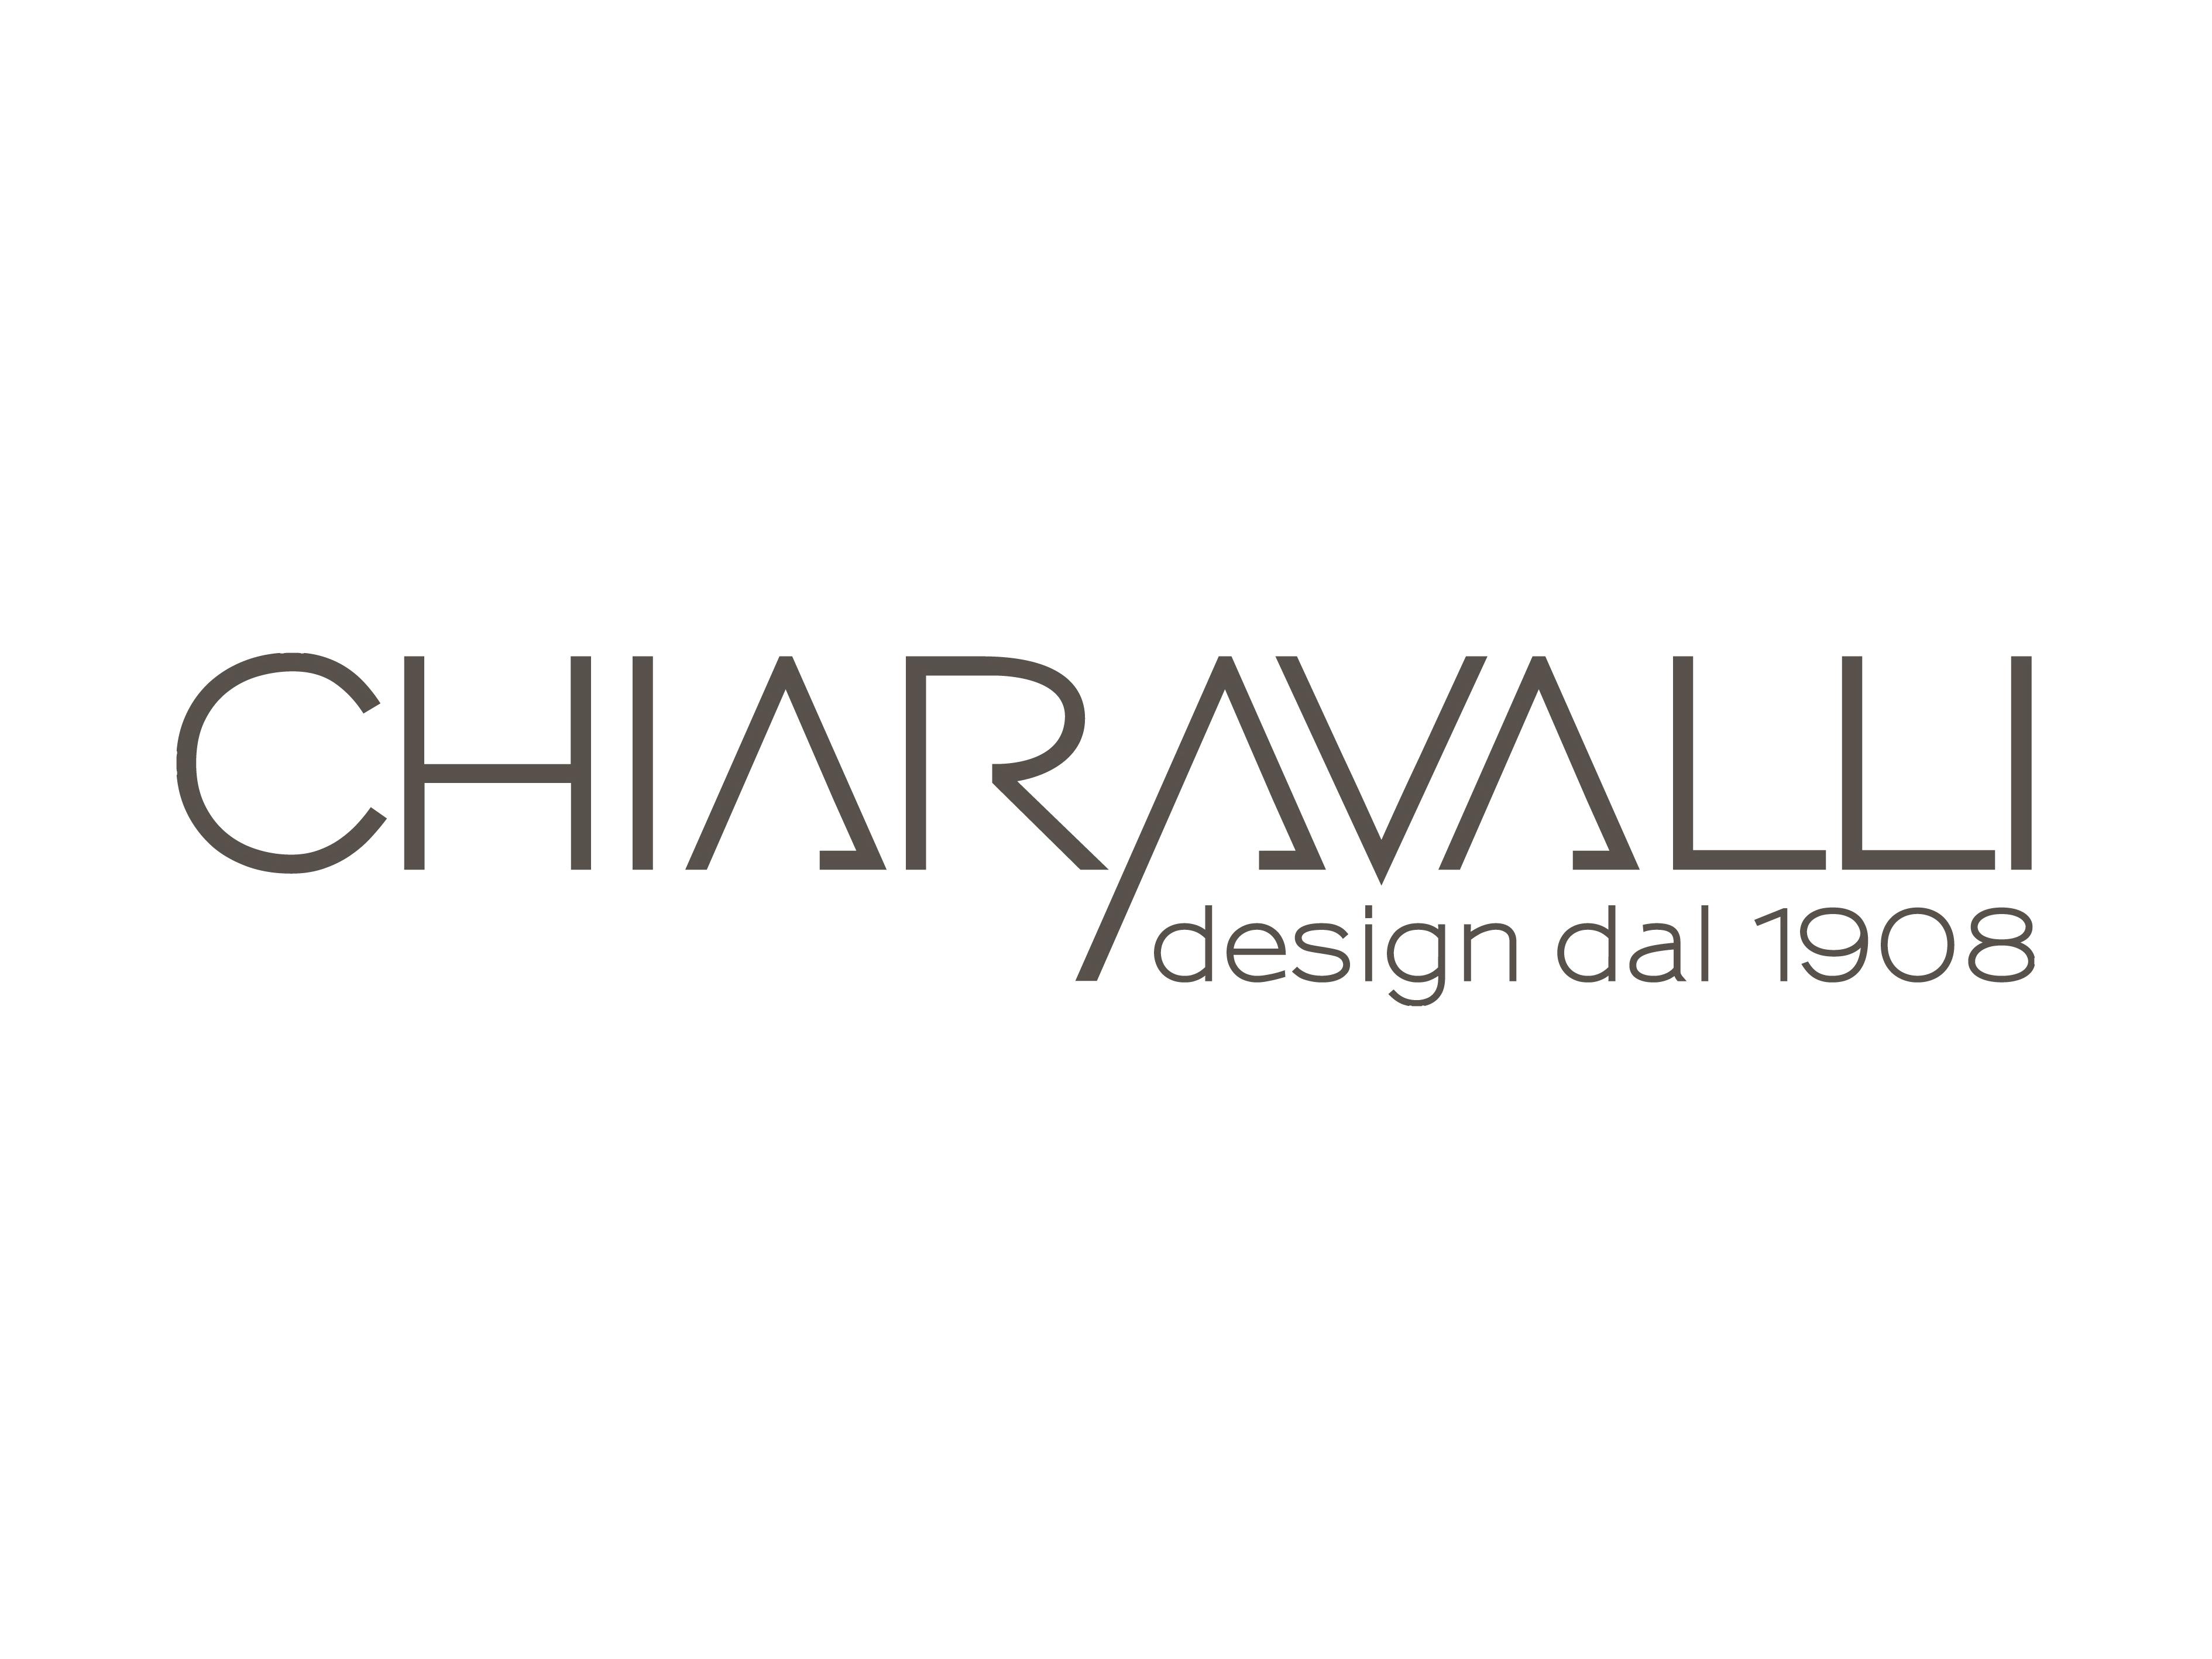 Chiaravalli_logo_def_outline